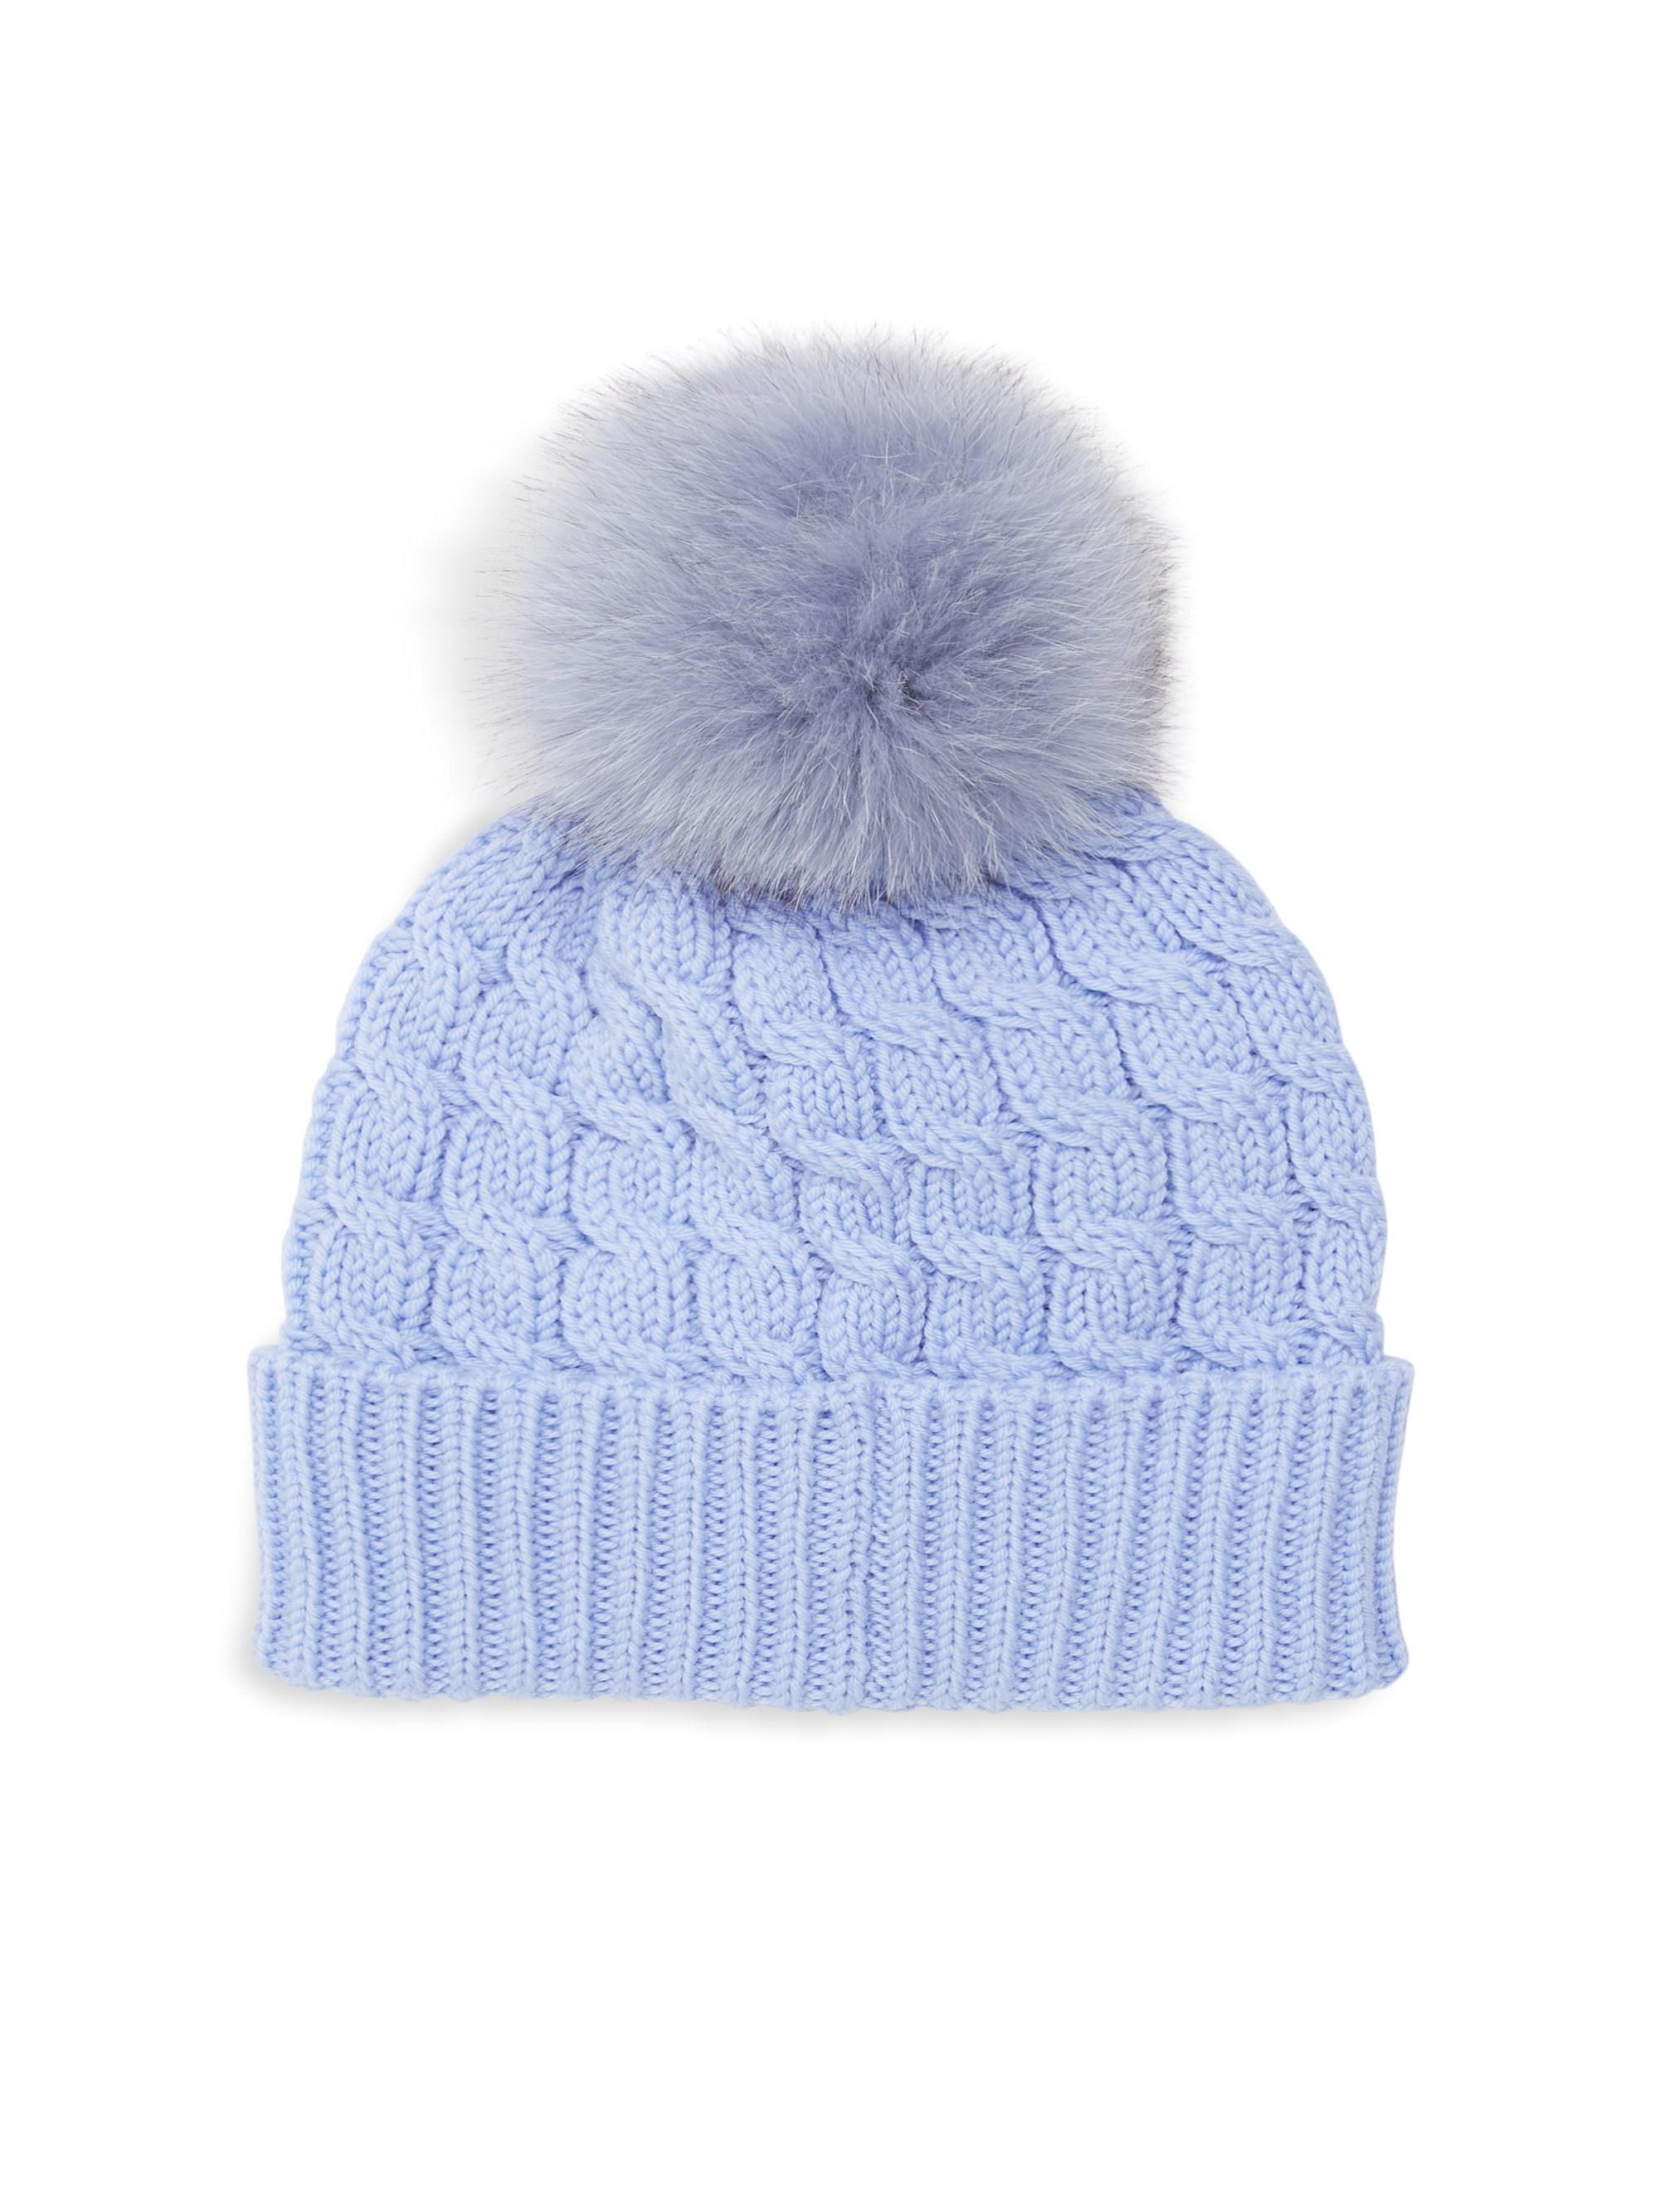 b2aaa48771c Moncler Grenoble Fox Fur Pom Pom Wool Beanie in Blue - Lyst